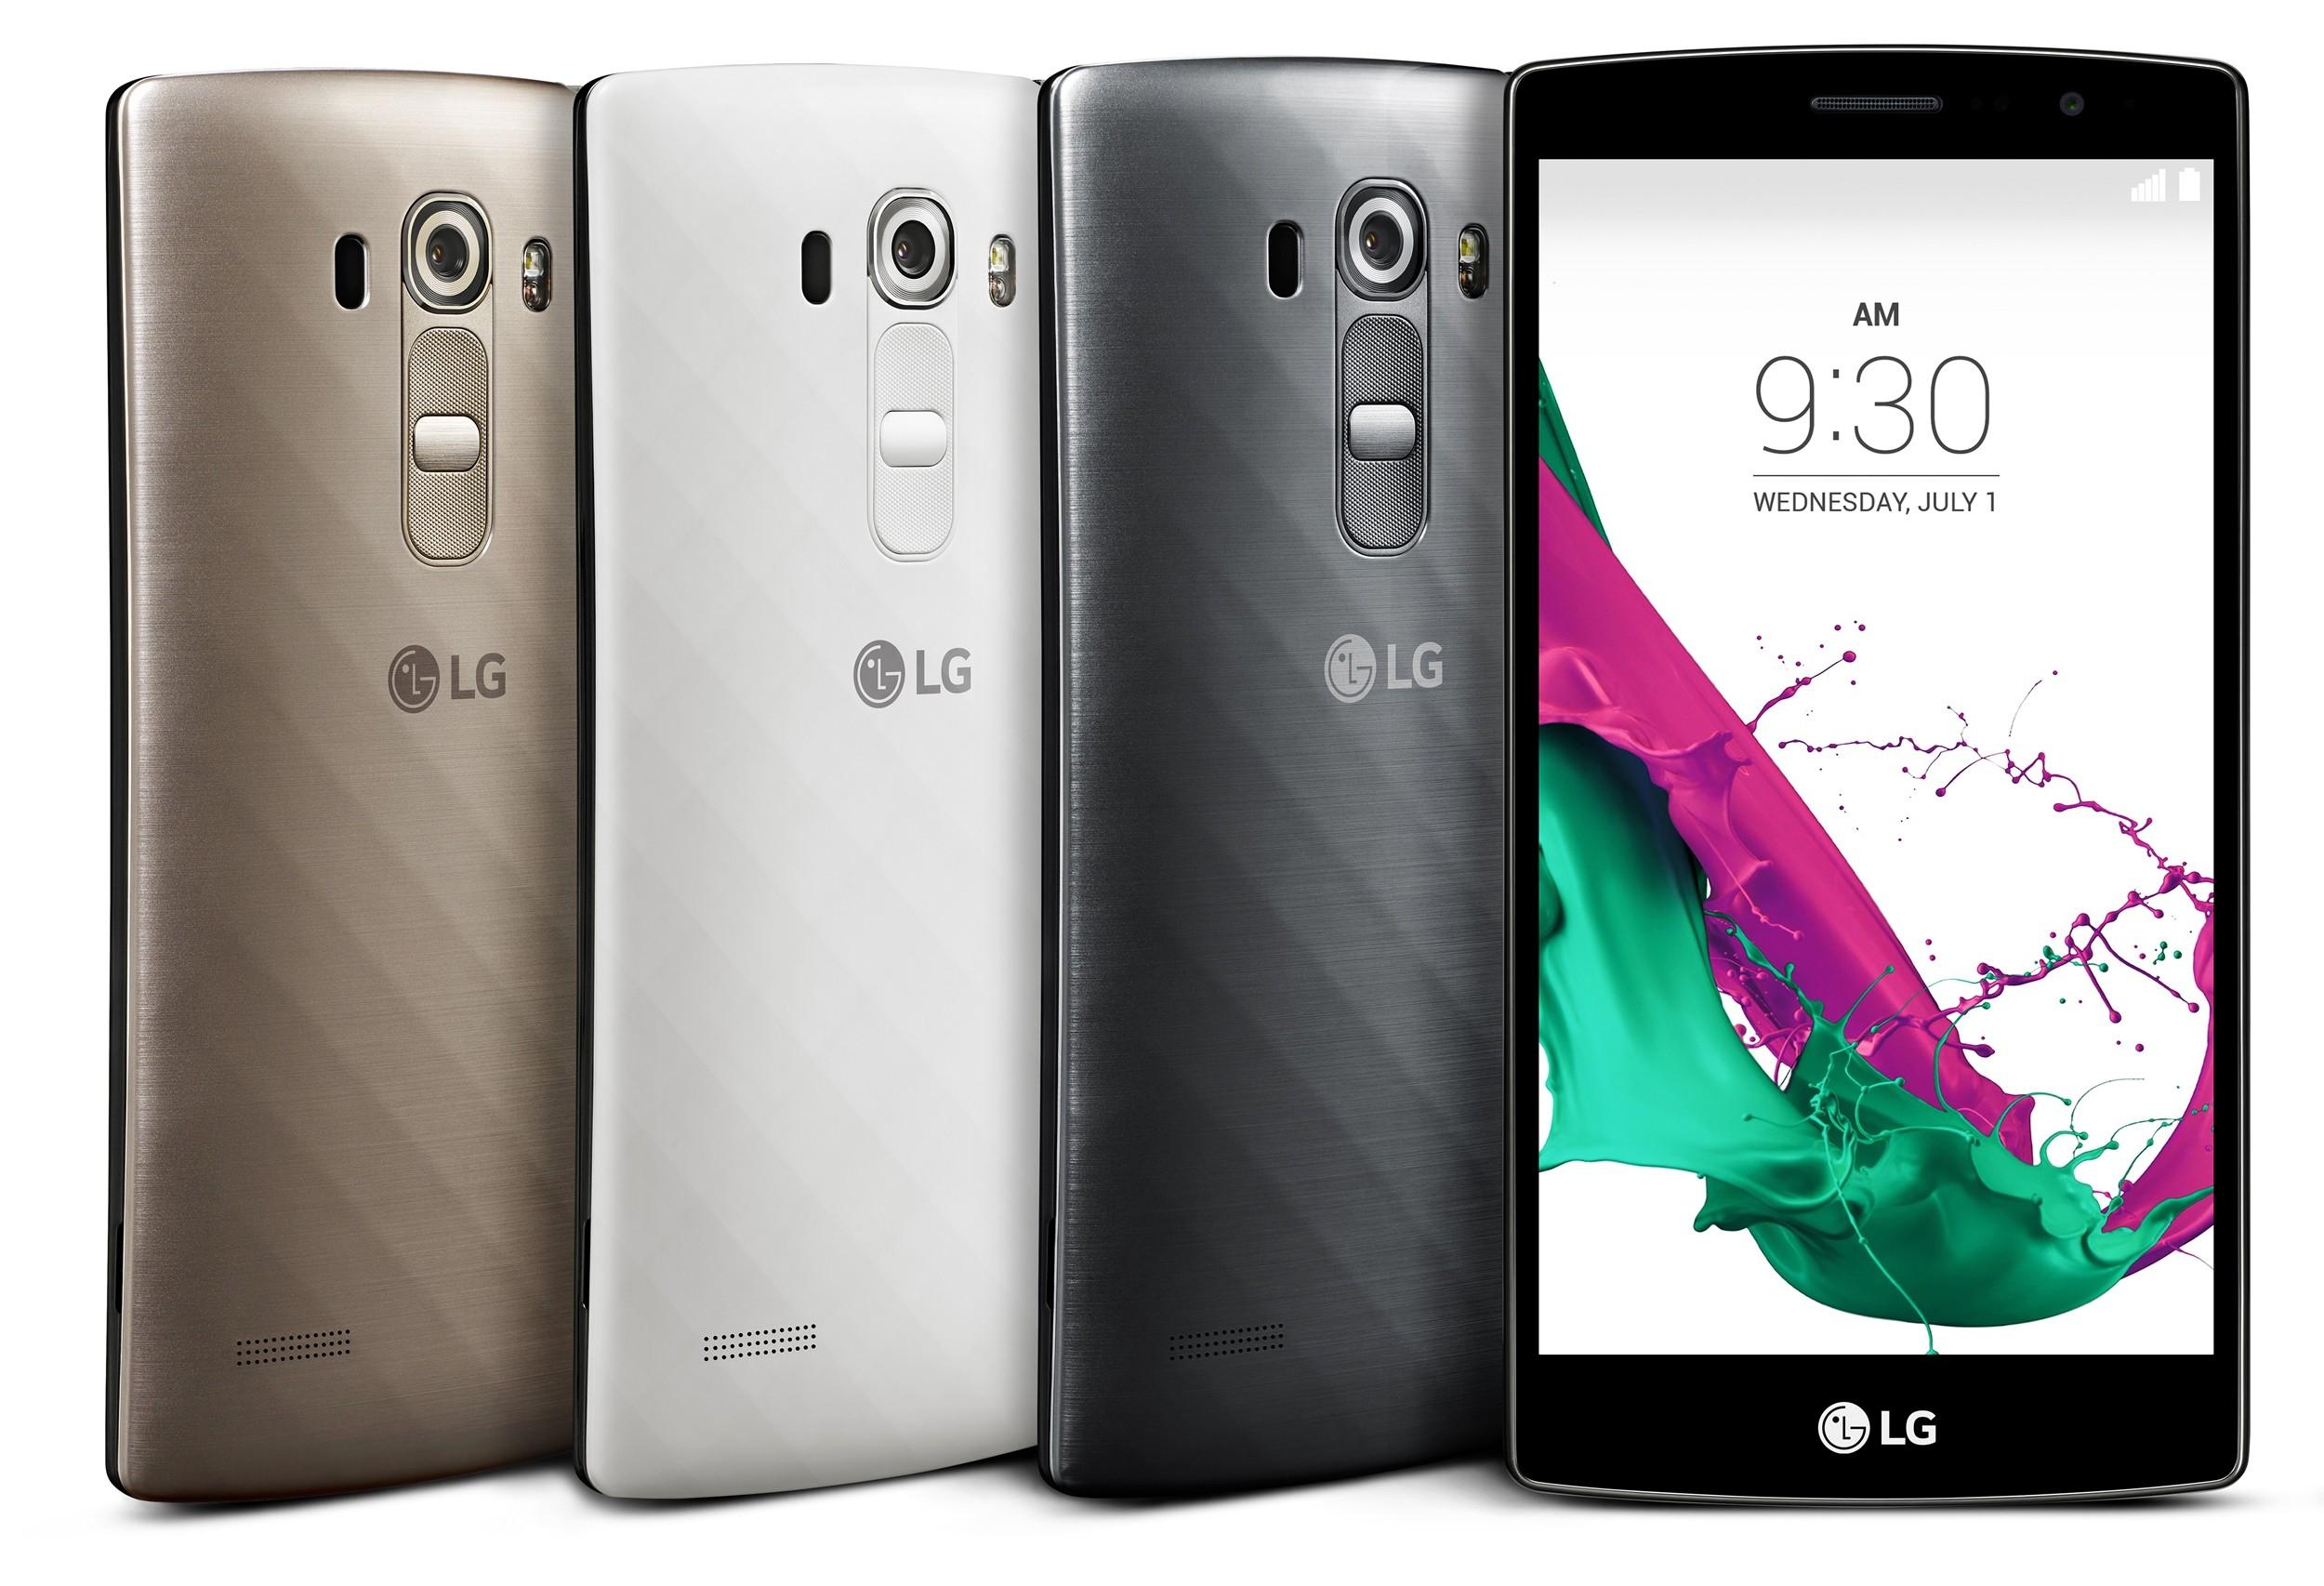 El firmware de Android 6.0 Marshmallow ya esta disponible en el LG G4 para flashear 1